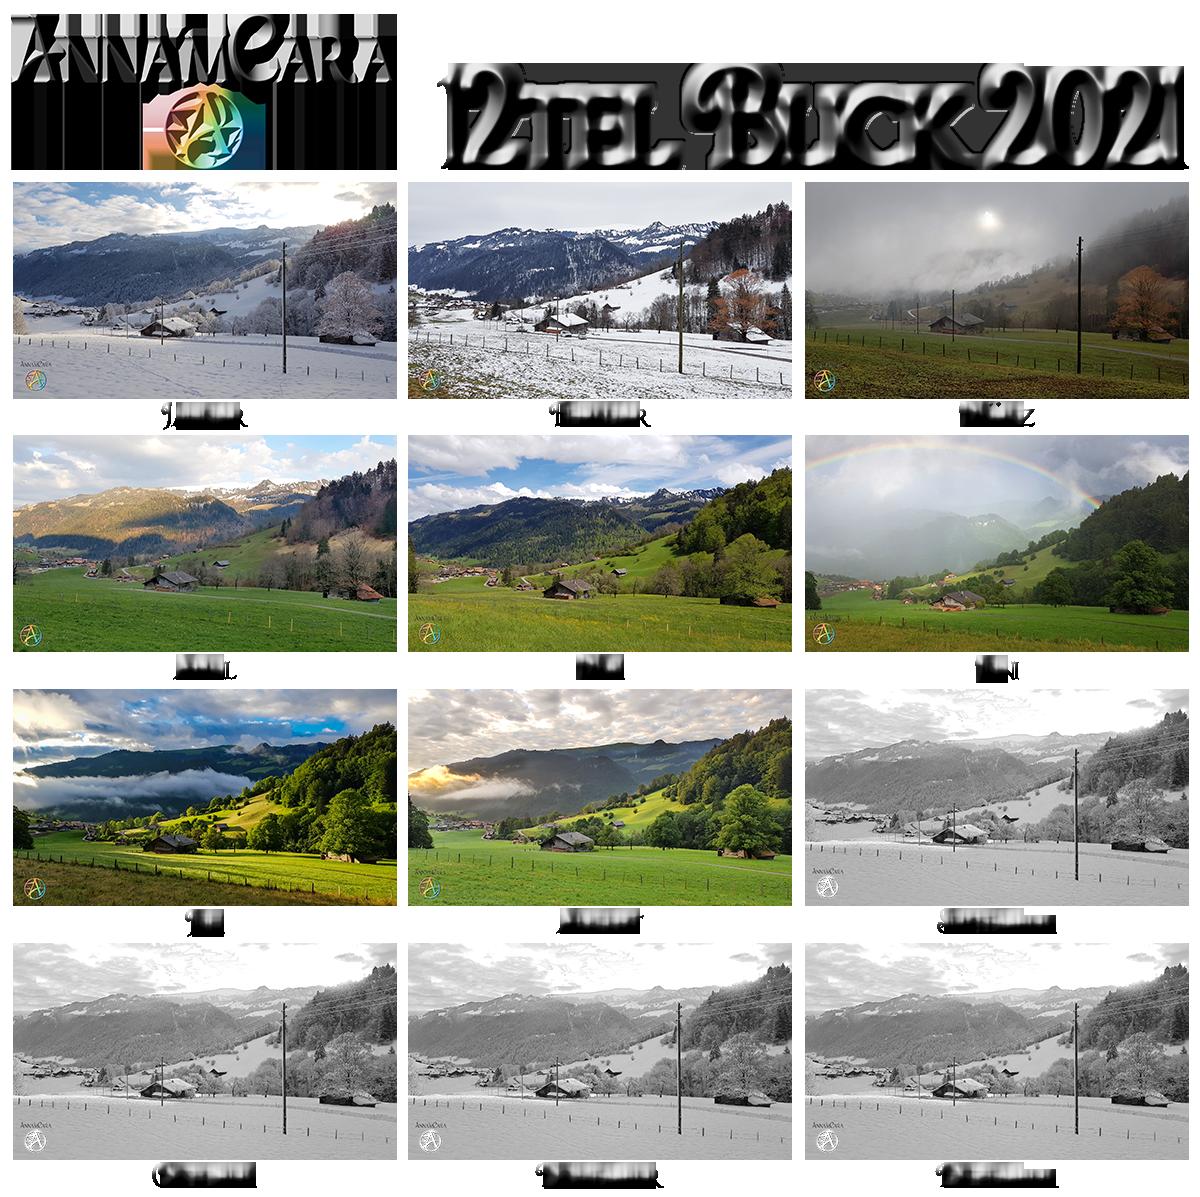 Anna'mCara-Blog - 12tel-Blick - Jahresblick - August